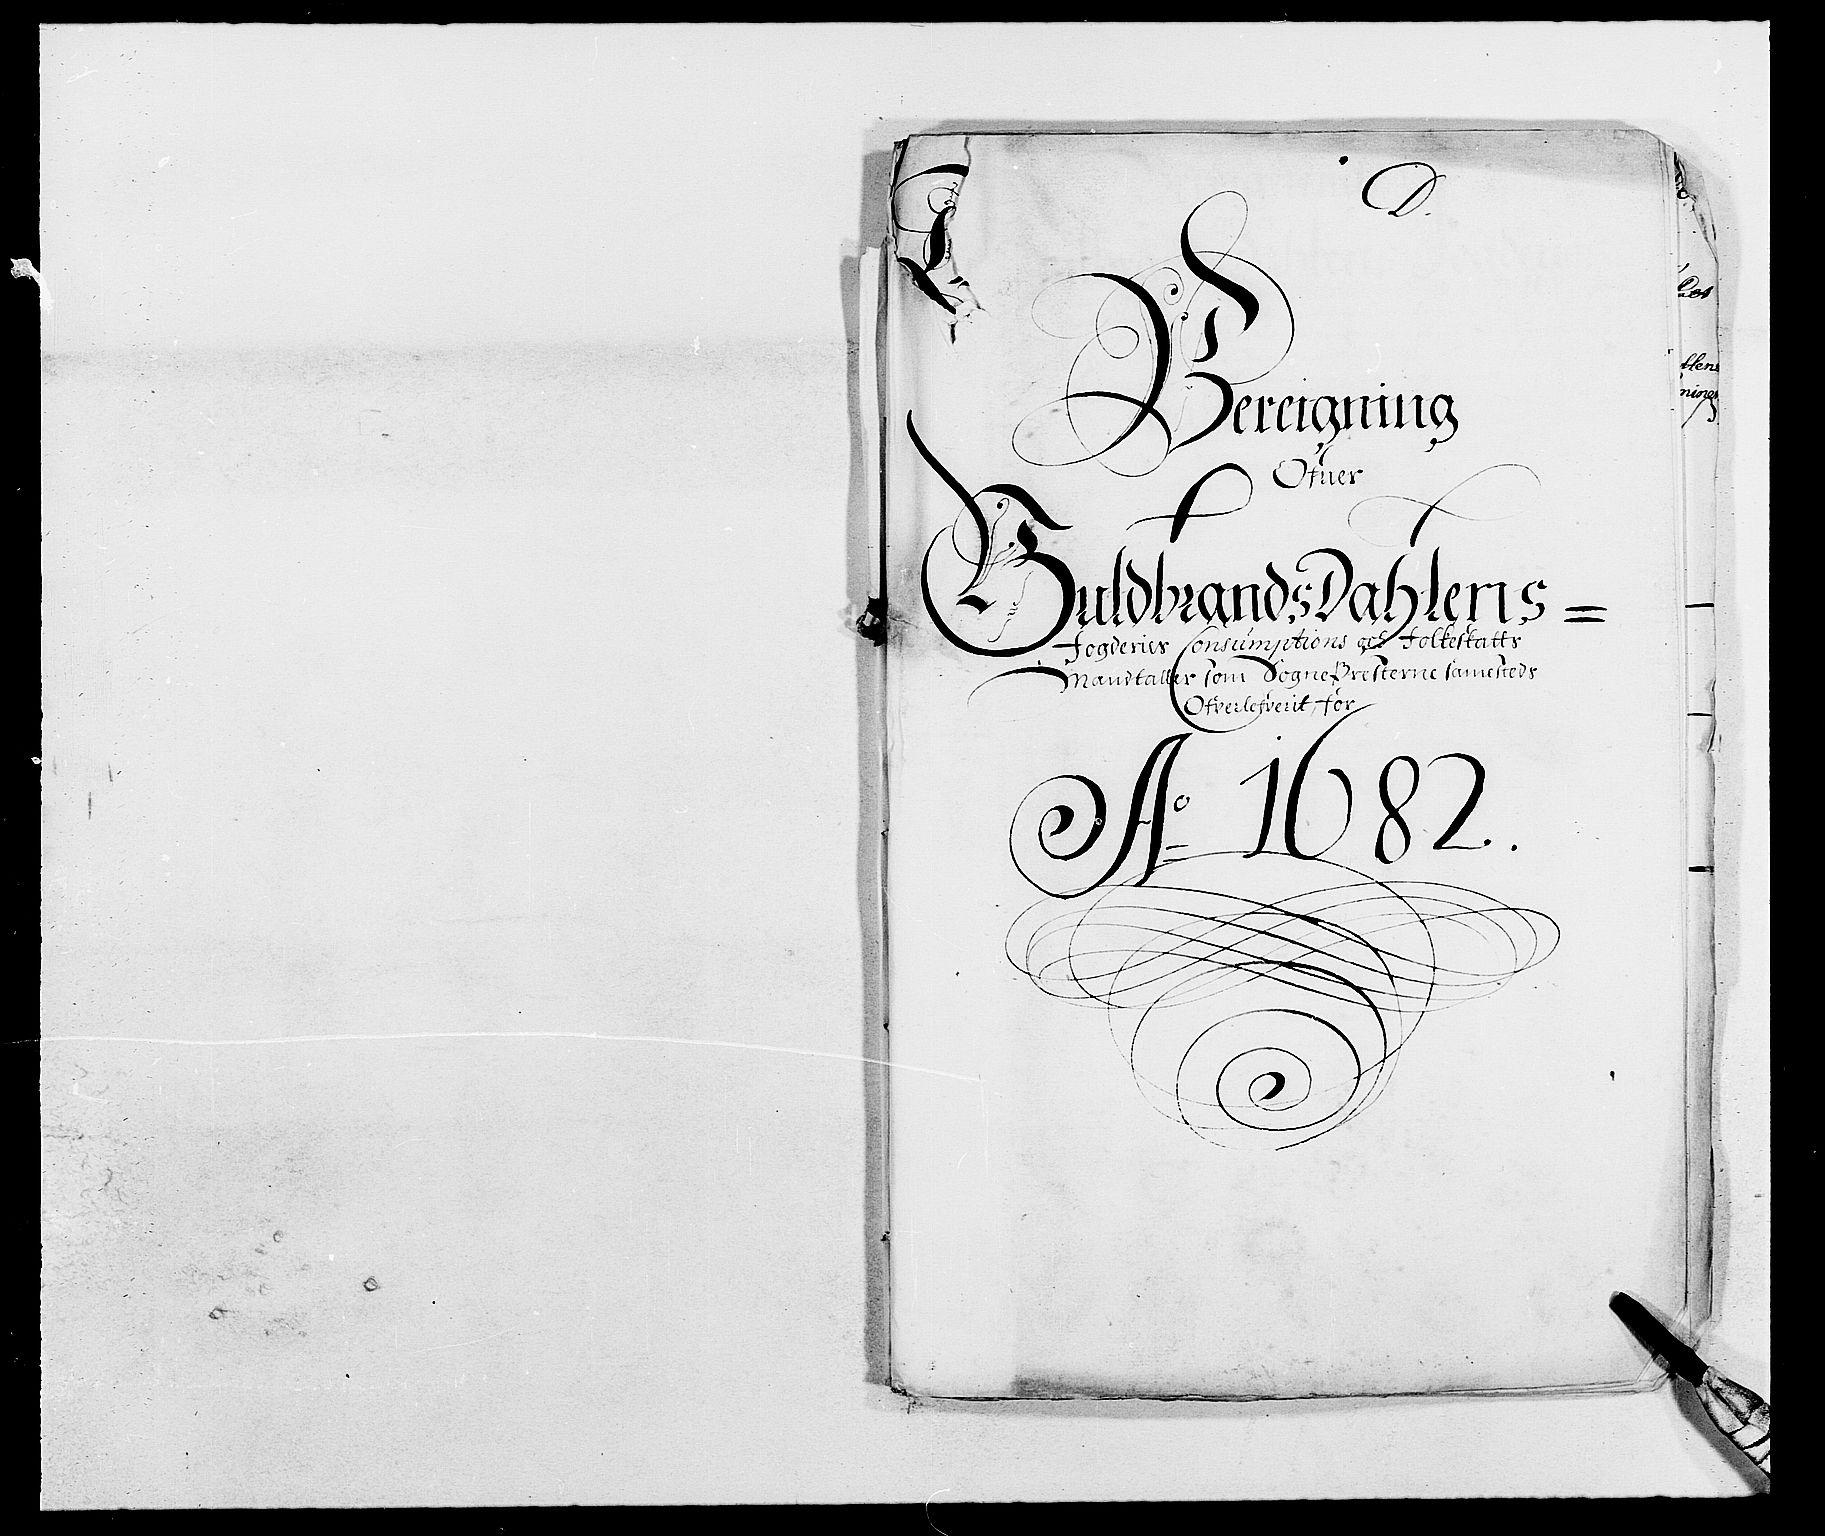 RA, Rentekammeret inntil 1814, Reviderte regnskaper, Fogderegnskap, R17/L1157: Fogderegnskap Gudbrandsdal, 1682-1689, s. 295